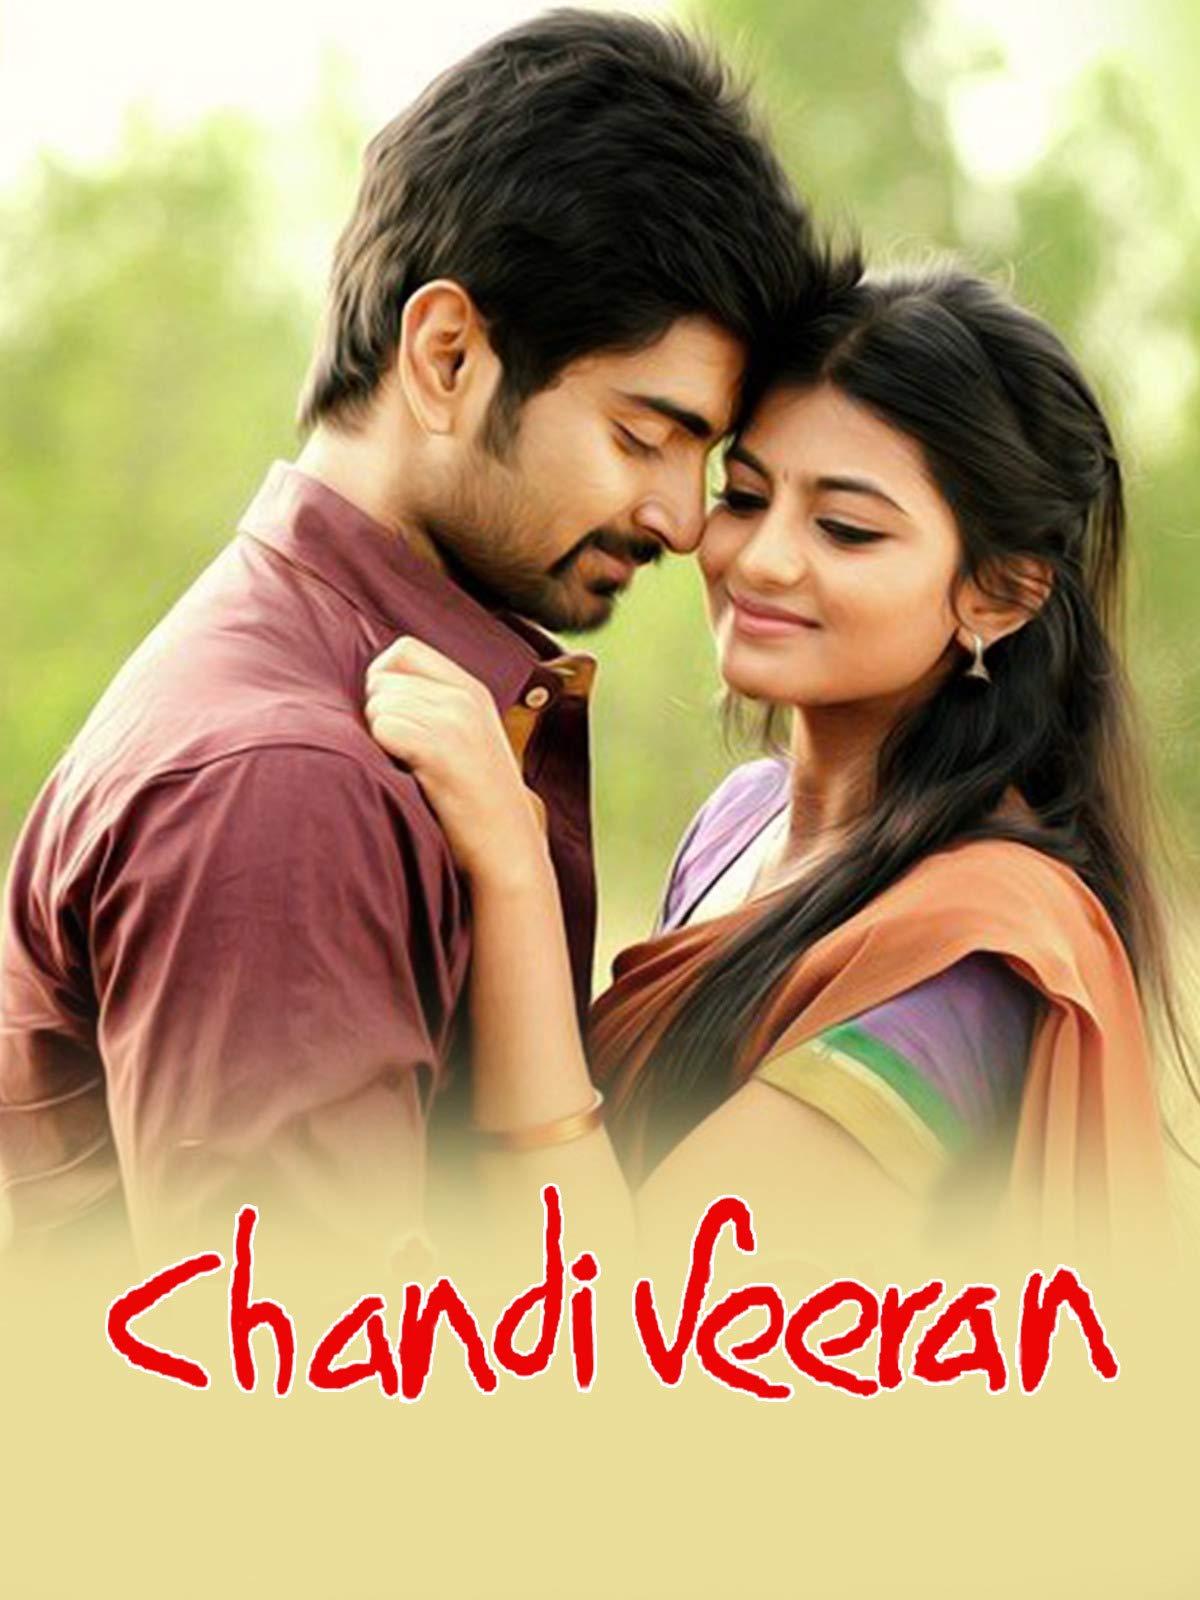 Chandi Veeran (Vilayati Hero) (2015) UNCUT Hindi Dubbed 720p HDRip Esubs DL